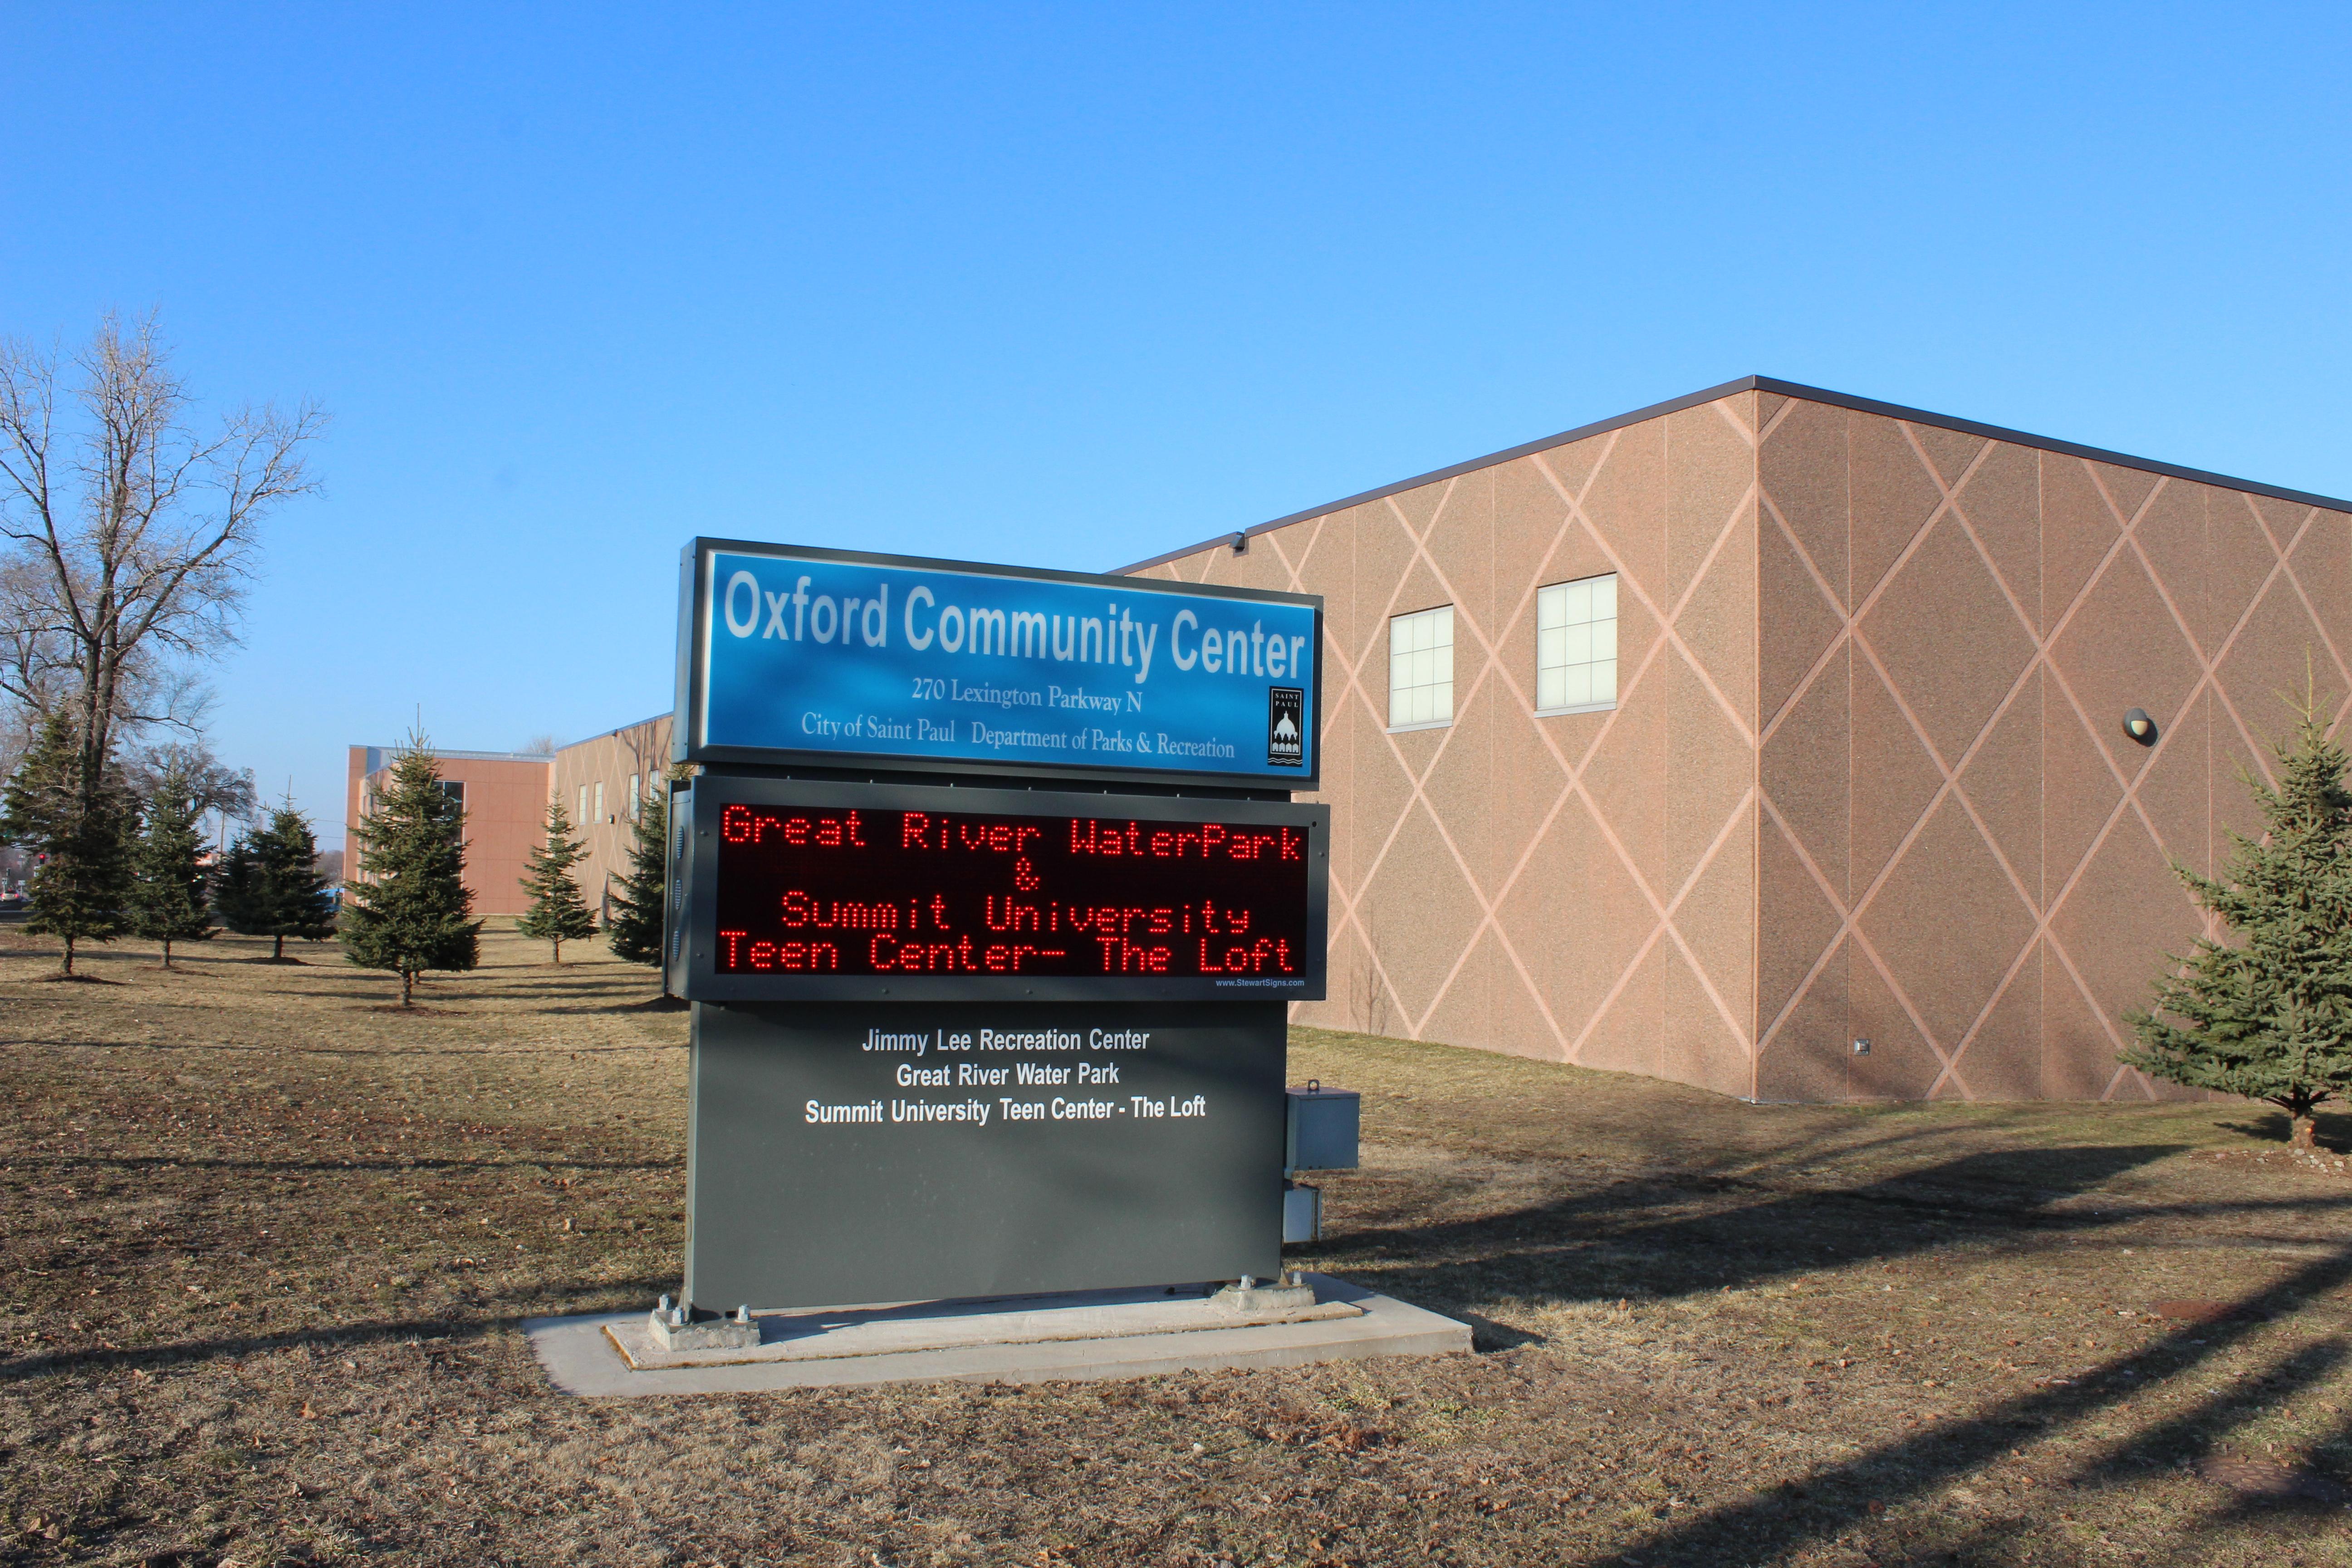 Oxford Community Center